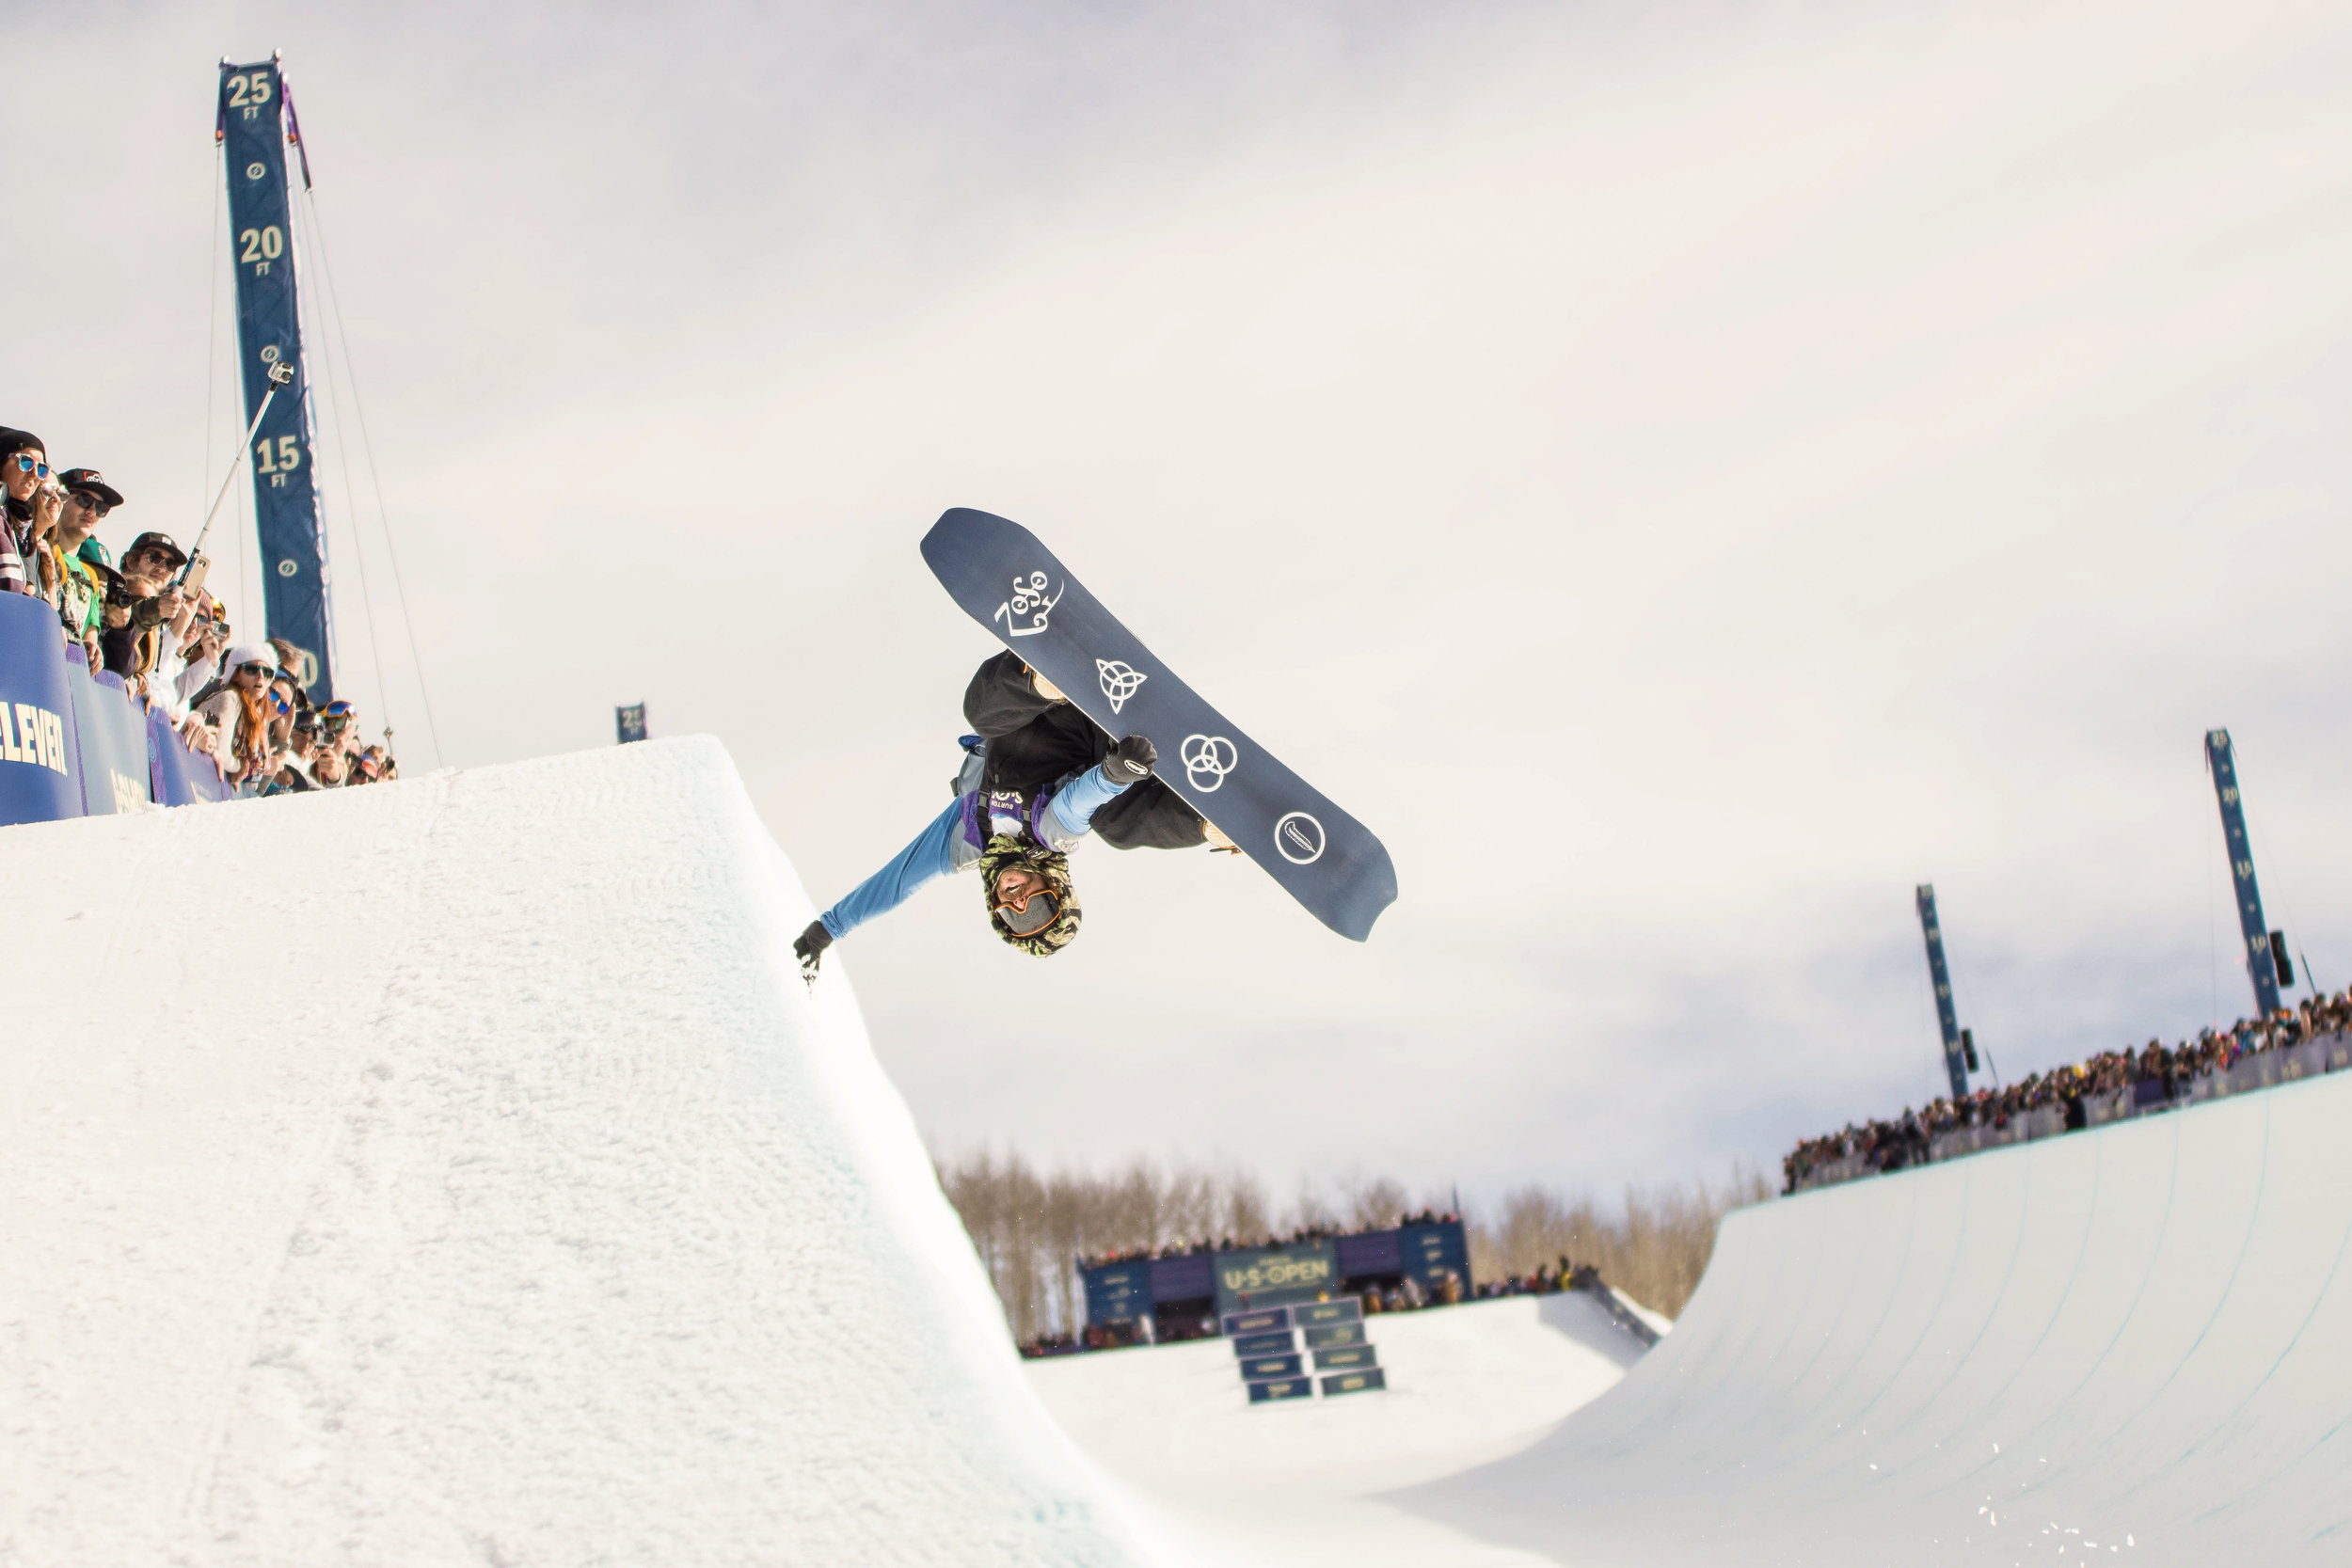 Snowboard Photography